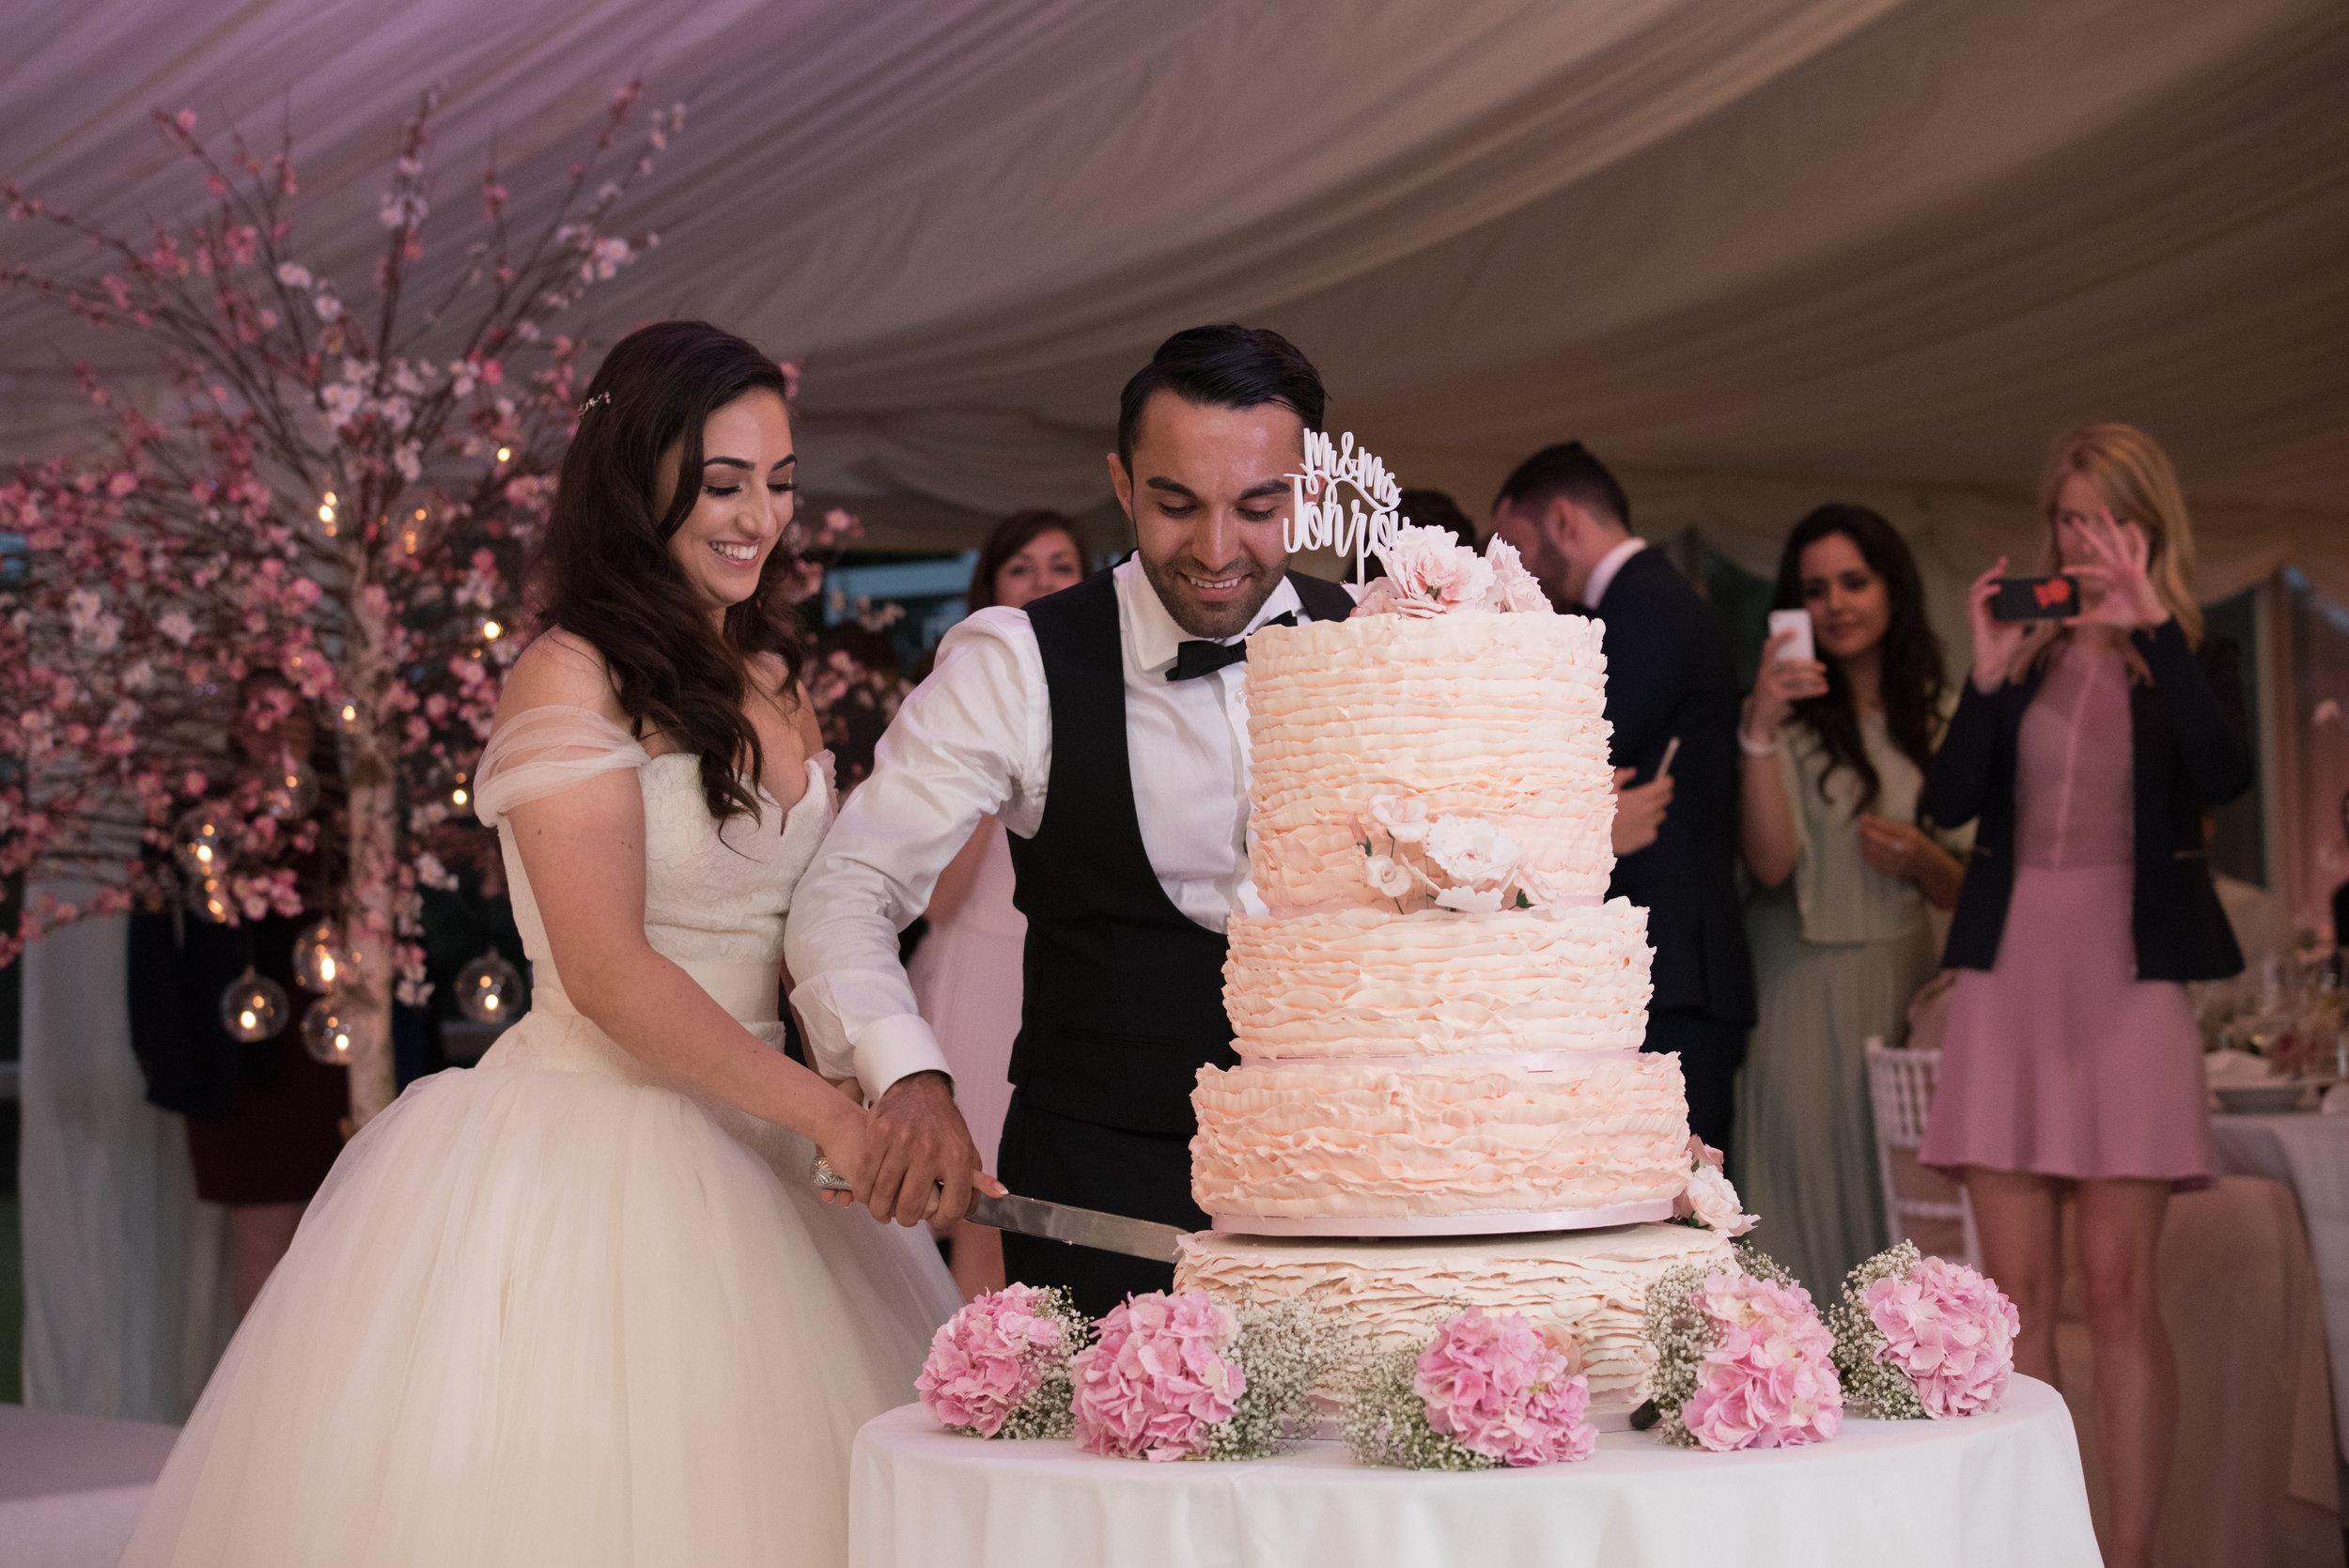 Danesfield House wedding, The Canny Cake Company, High Wycombe wedding, Buckinghamshire wedding